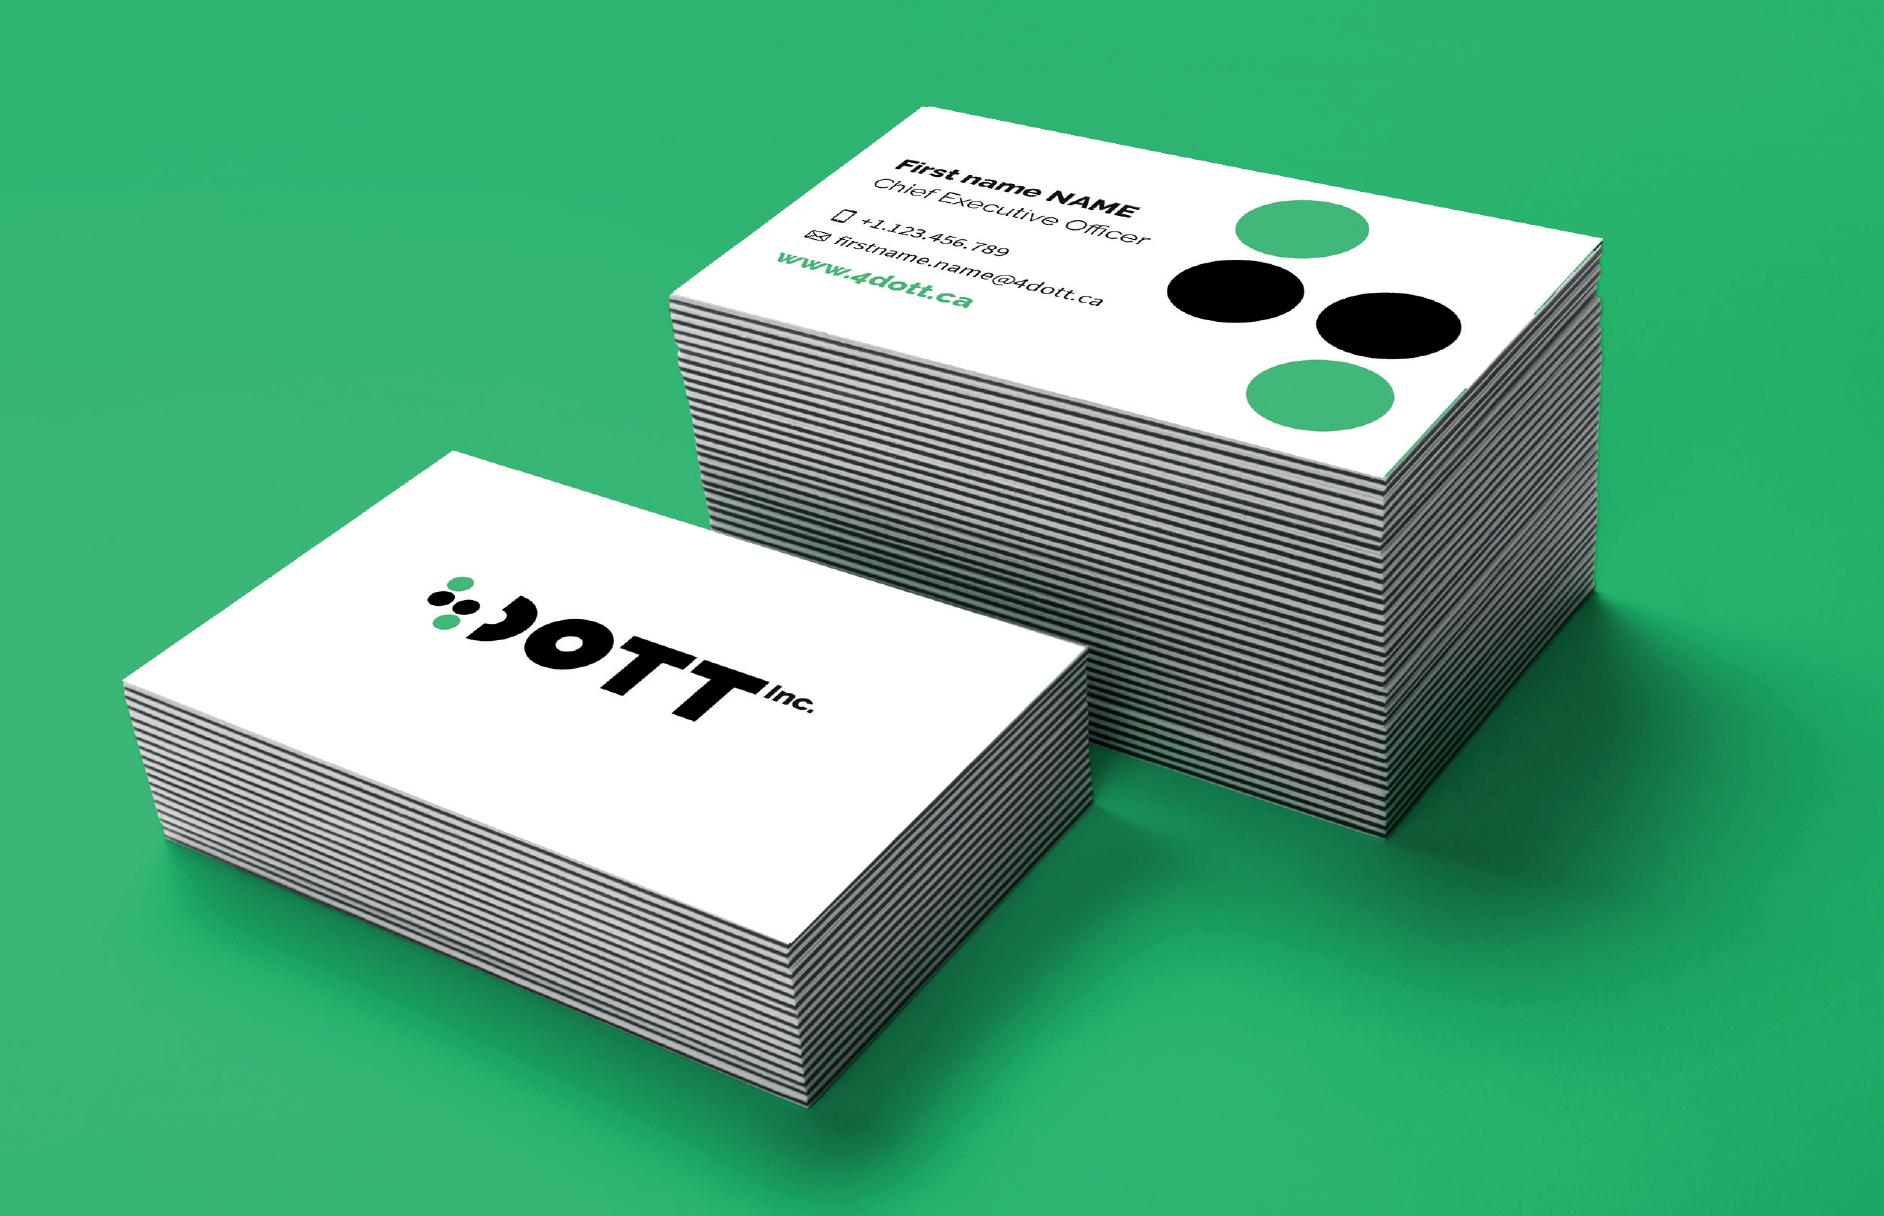 branding-business-cards-logos-2-unsmushed